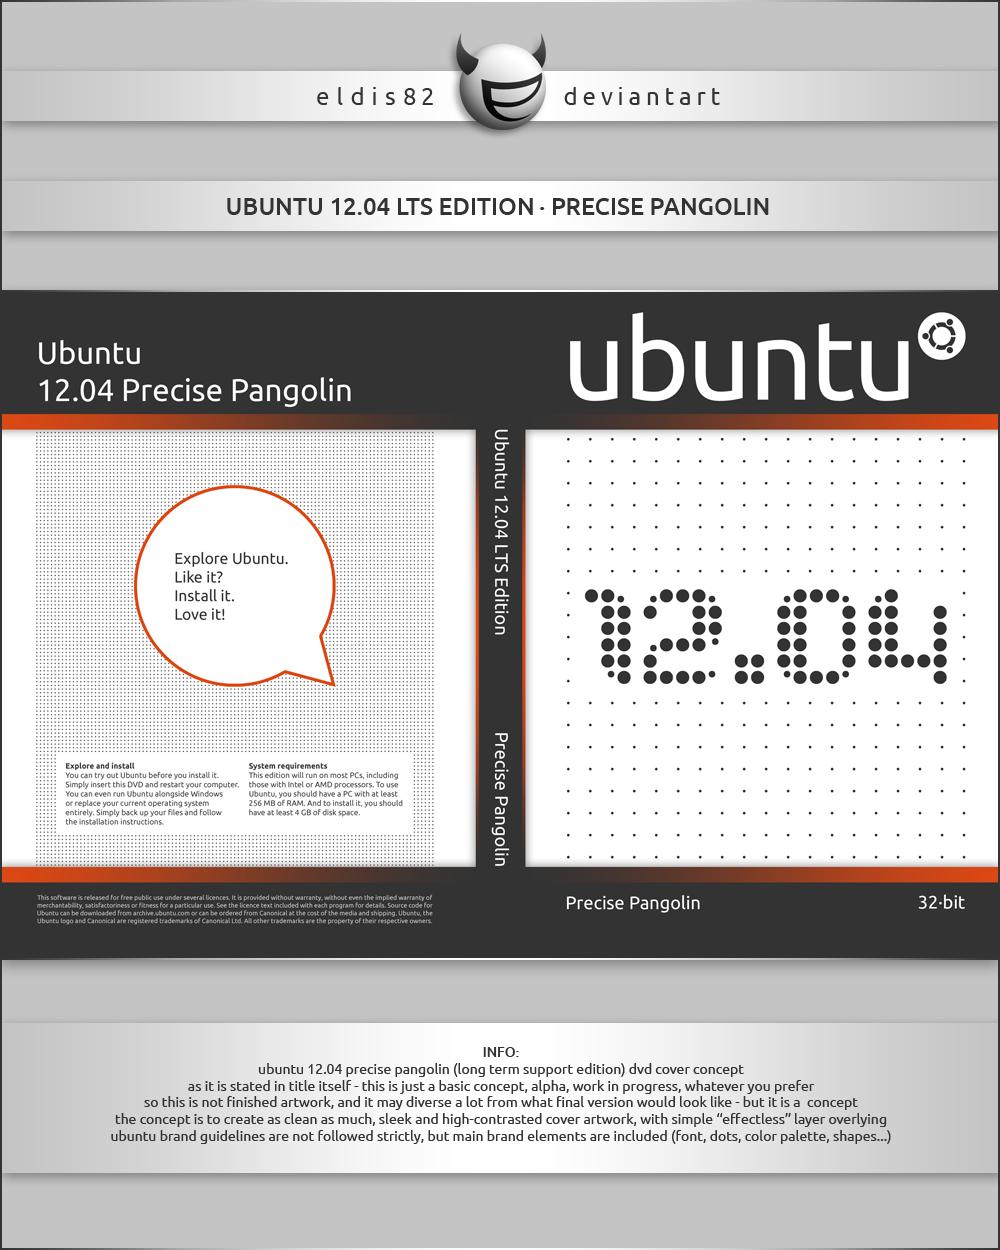 Ubuntu 12.04 Precise Pangolin WIP